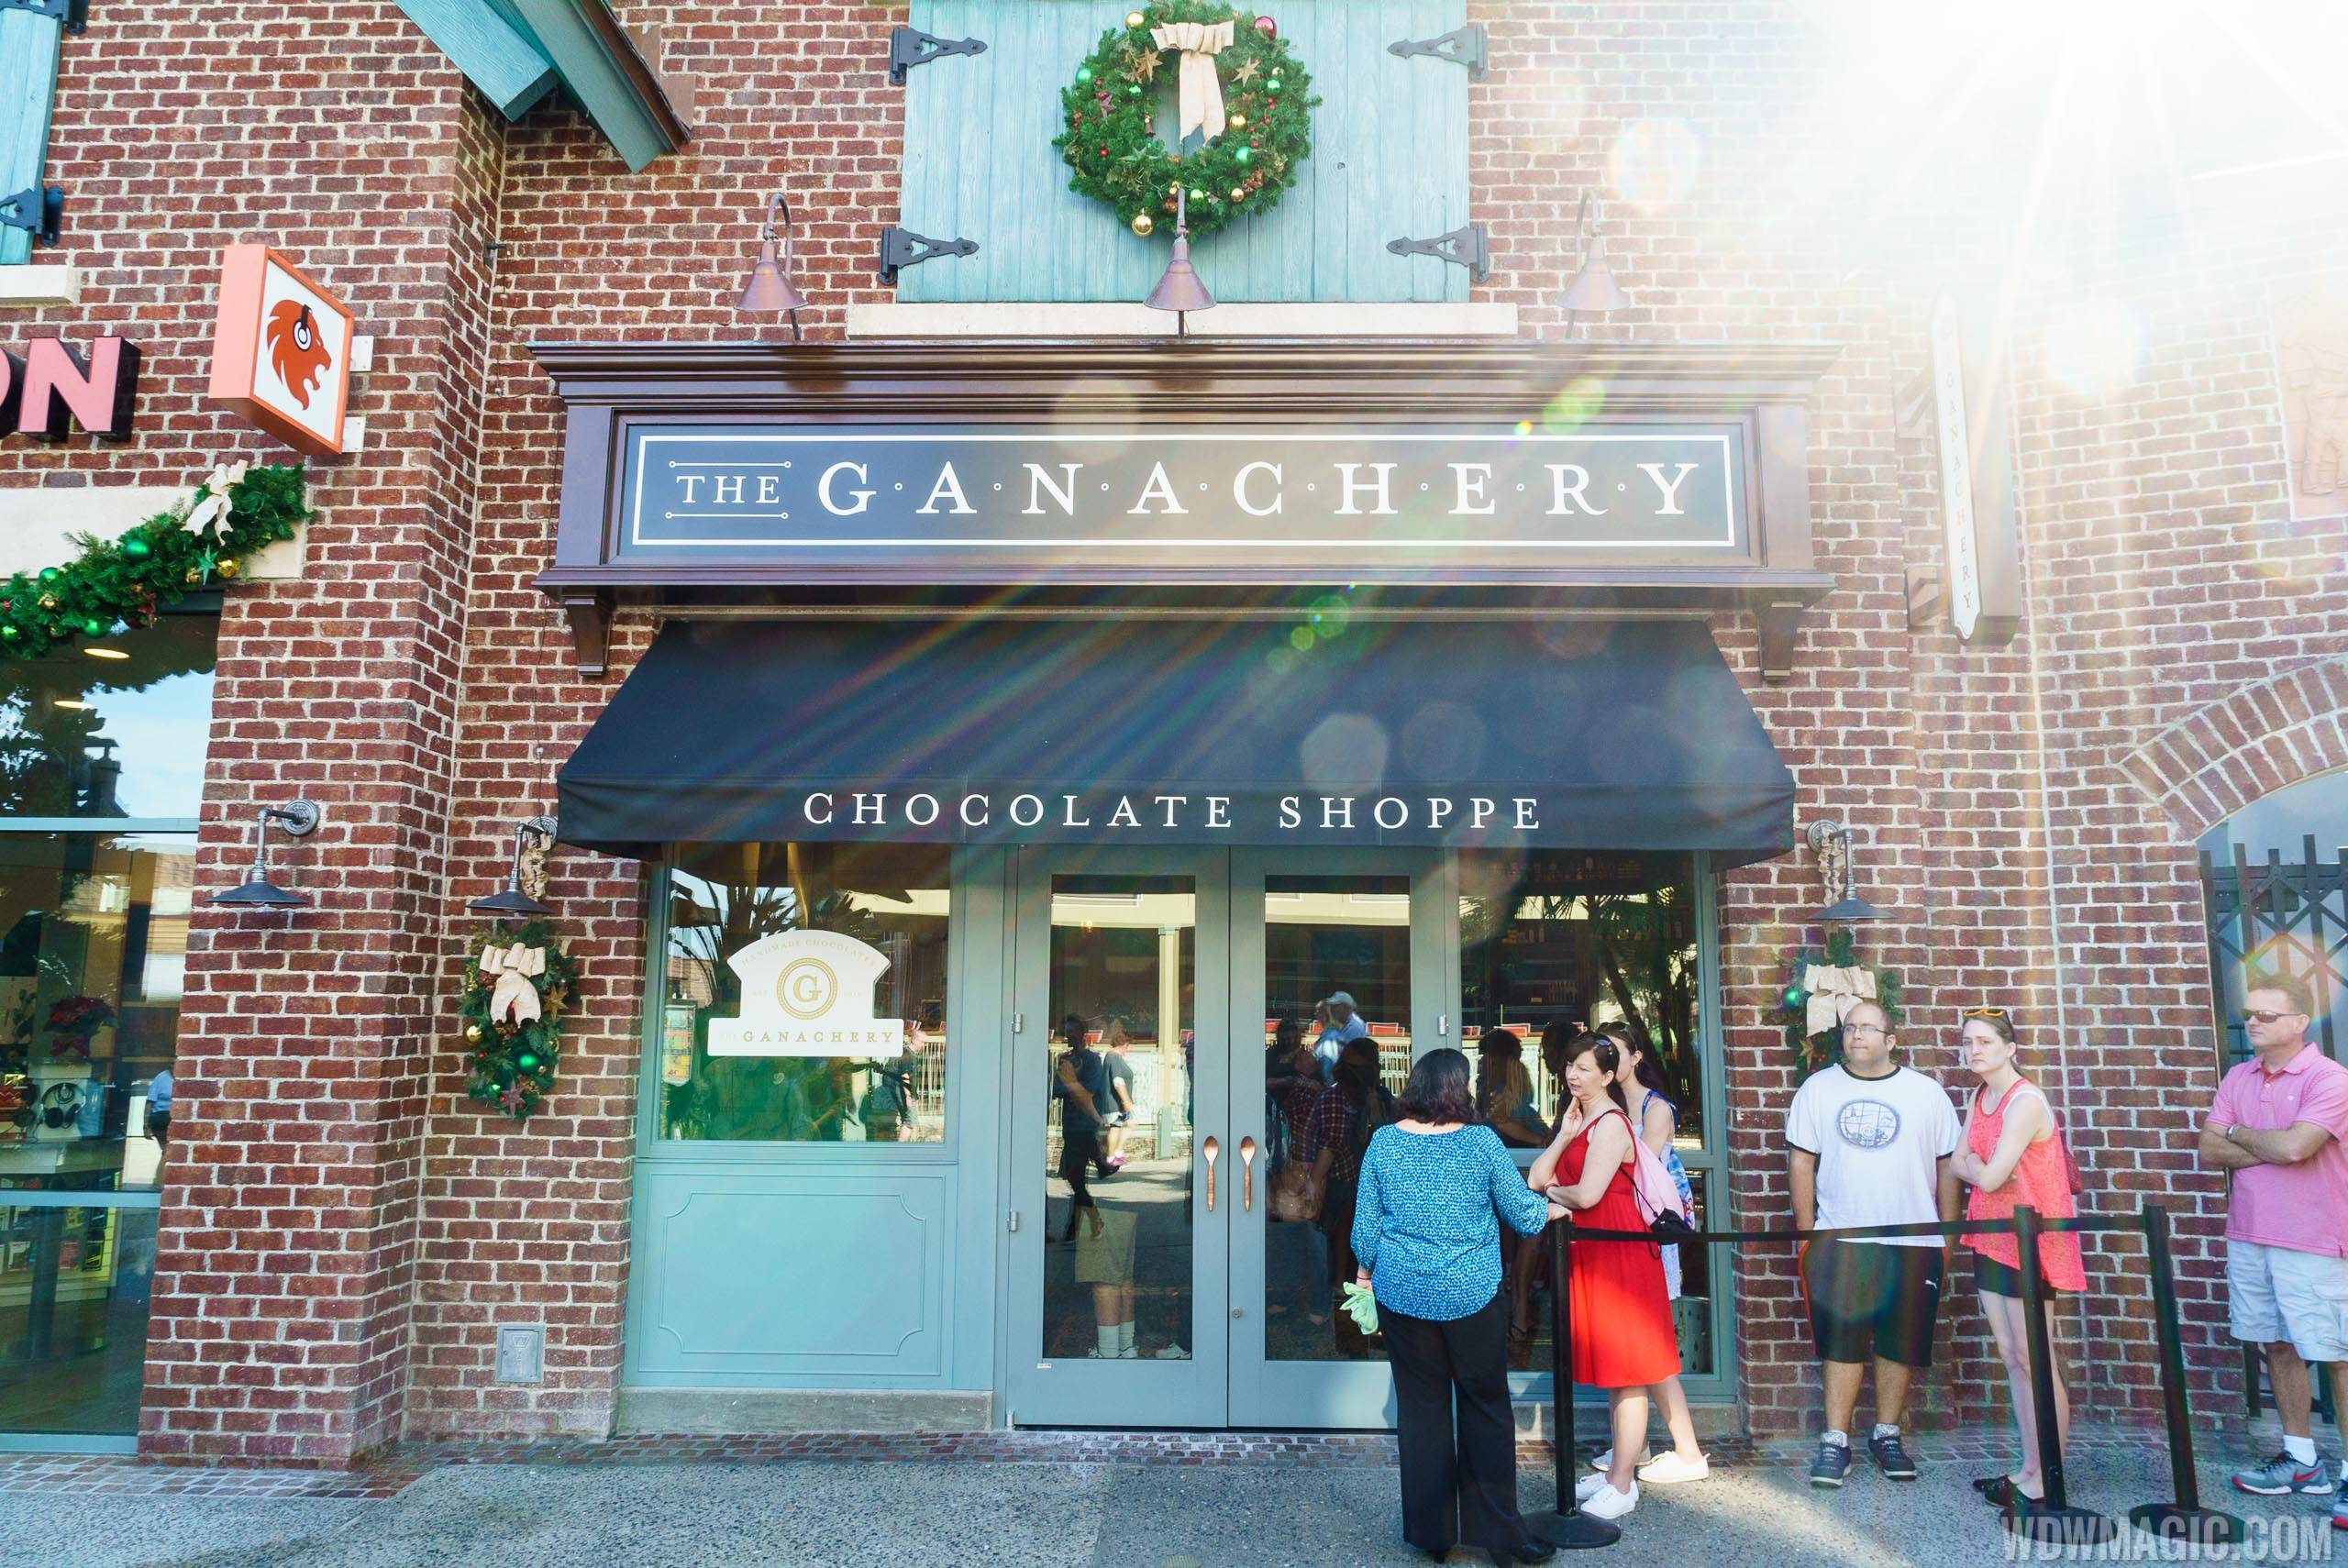 The Ganachery overview